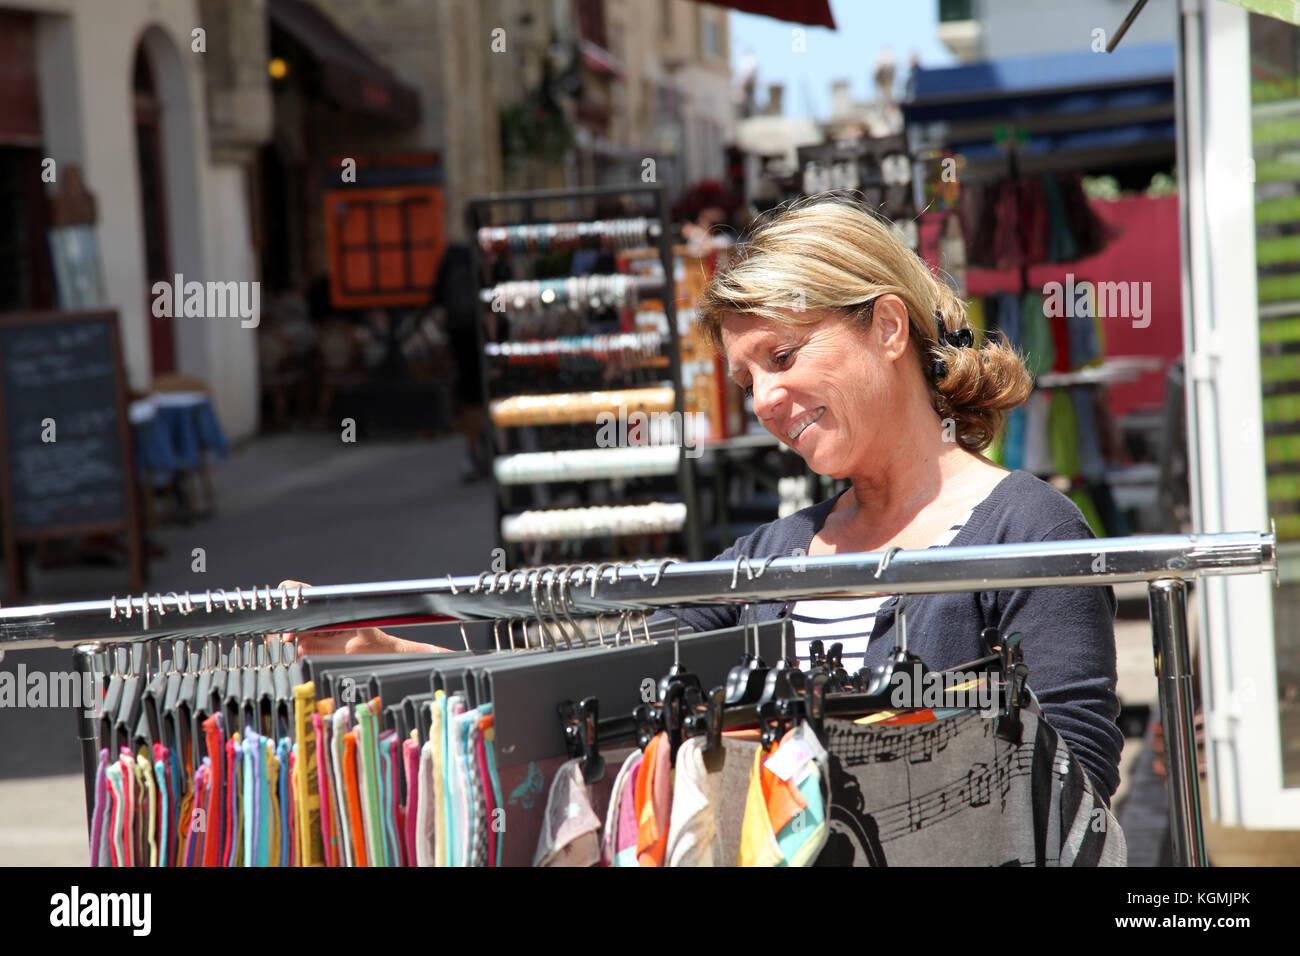 Mature woman doing shopping in seaside resort shops - Stock Image